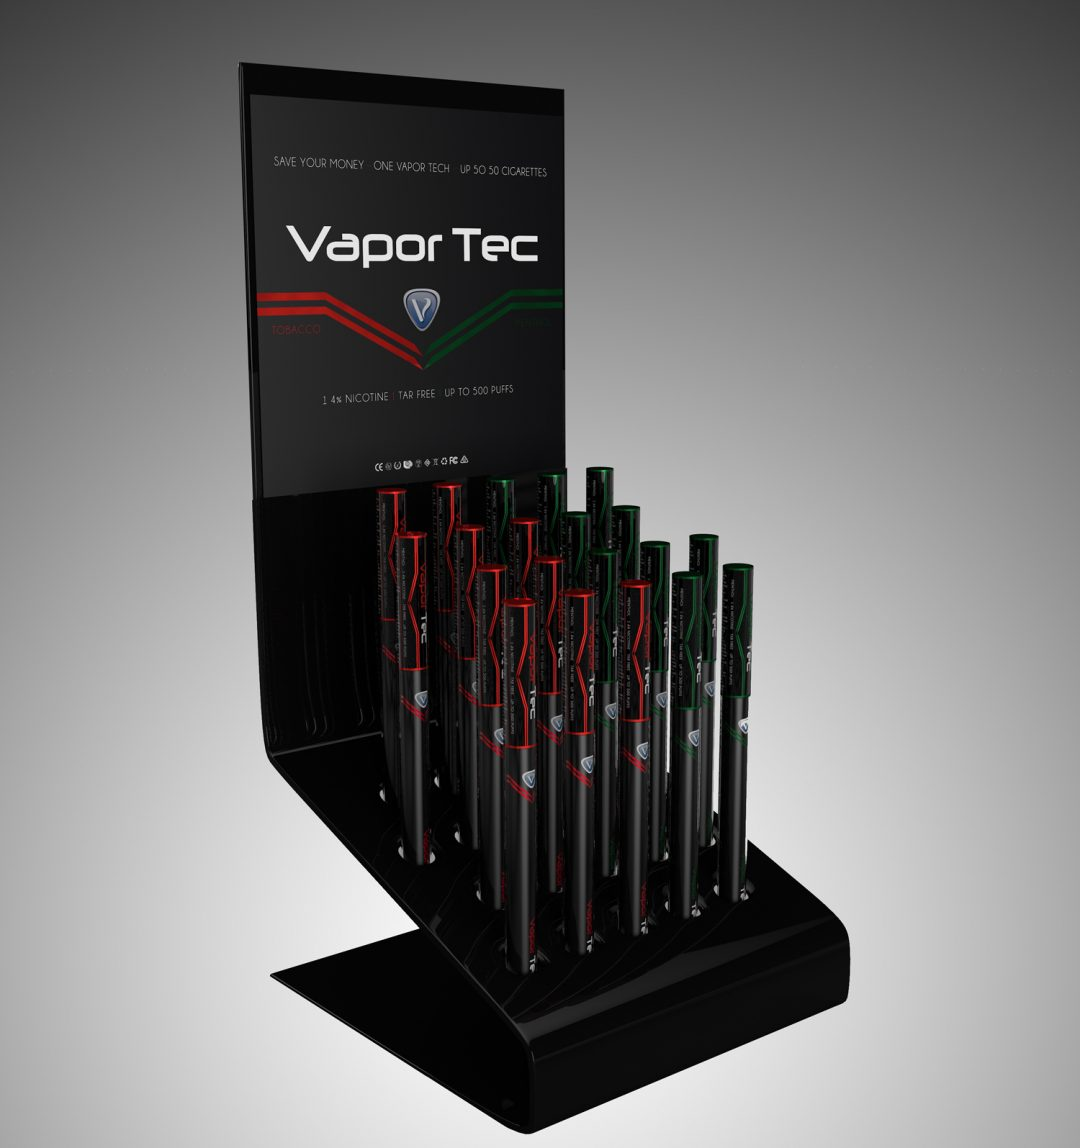 Vapor Tec store display